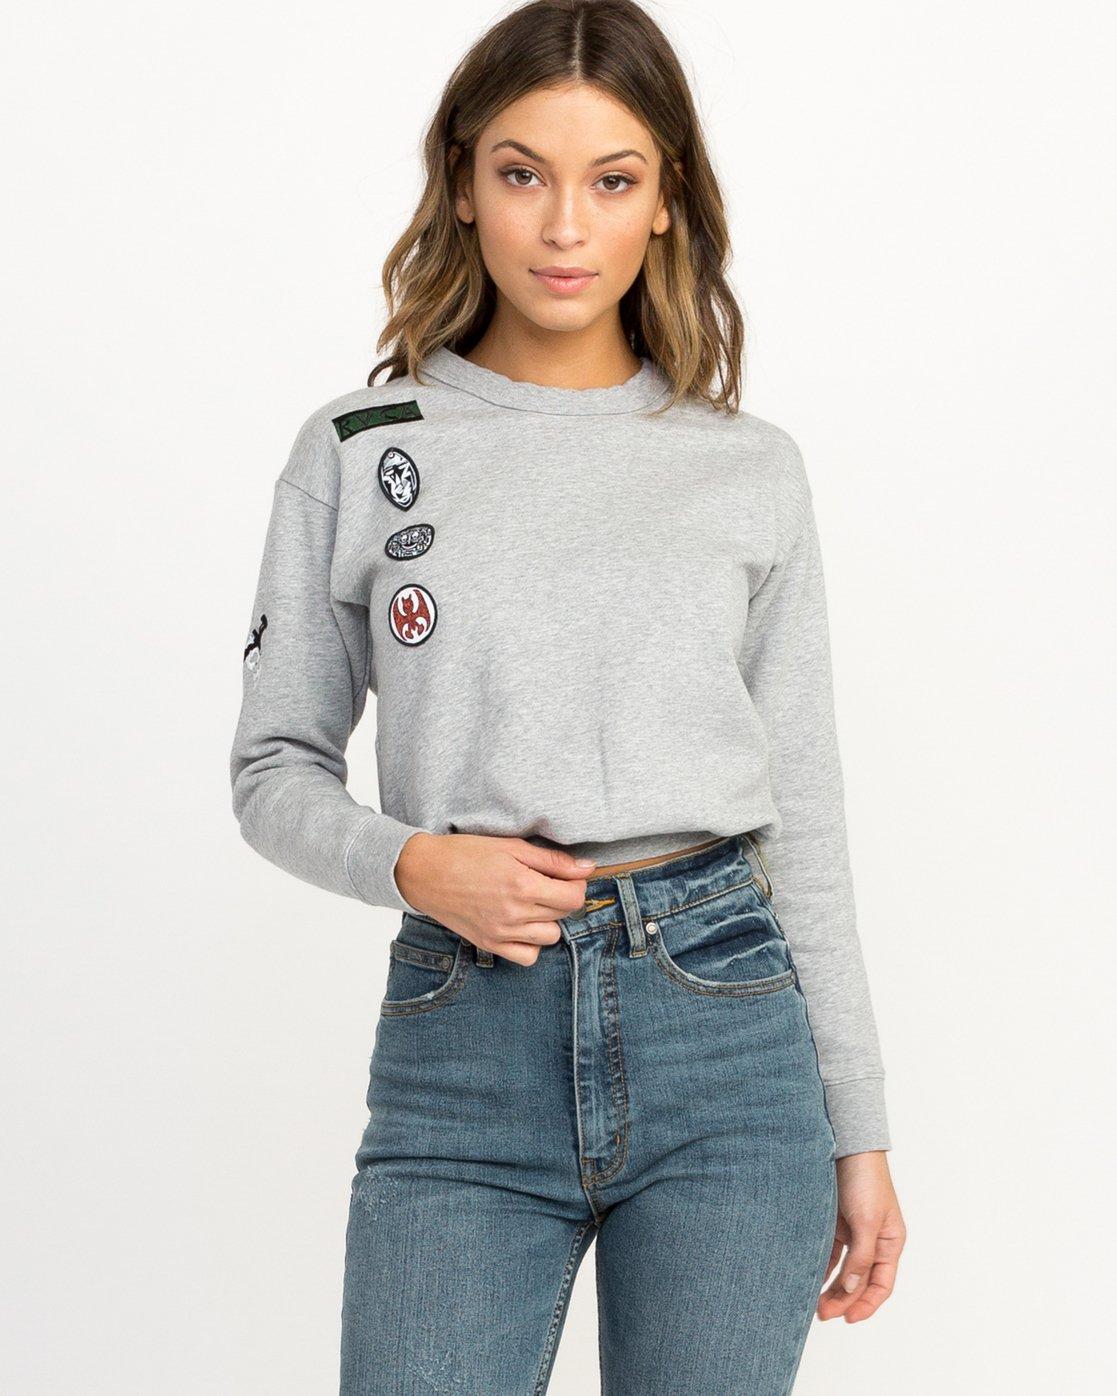 0 Joe Grillo Patch Sweatshirt Grey W608QRGR RVCA